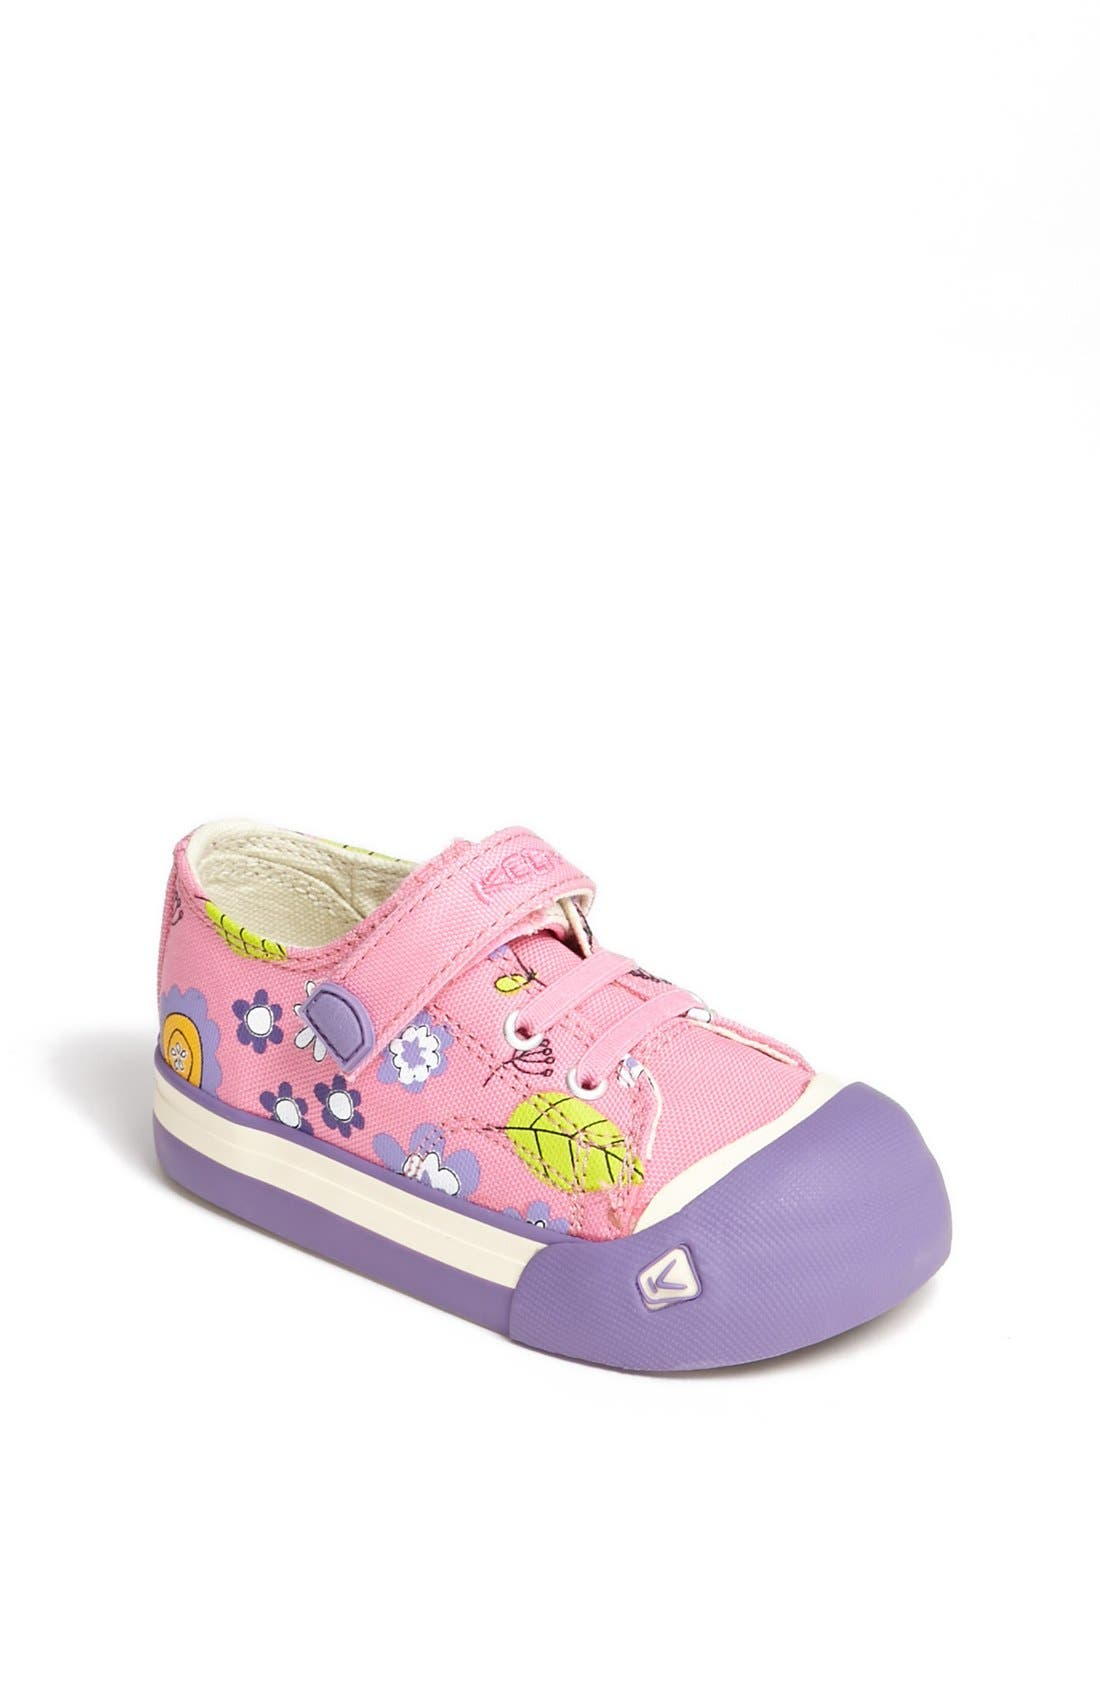 Alternate Image 1 Selected - Keen 'Coronado' Print Sneaker (Baby, Walker, Toddler & Little Kid)